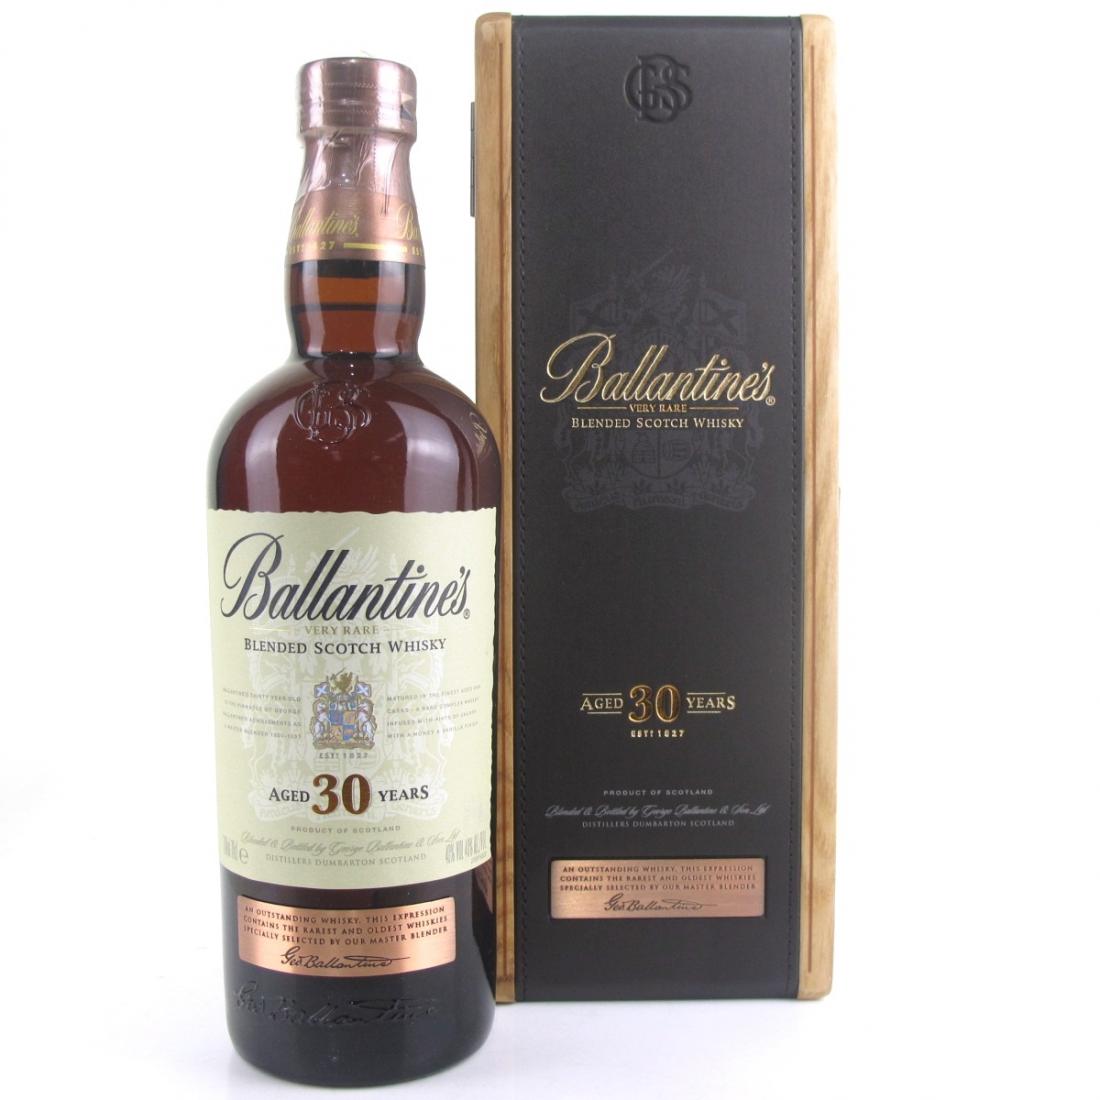 Ballantine's 30 Year Old